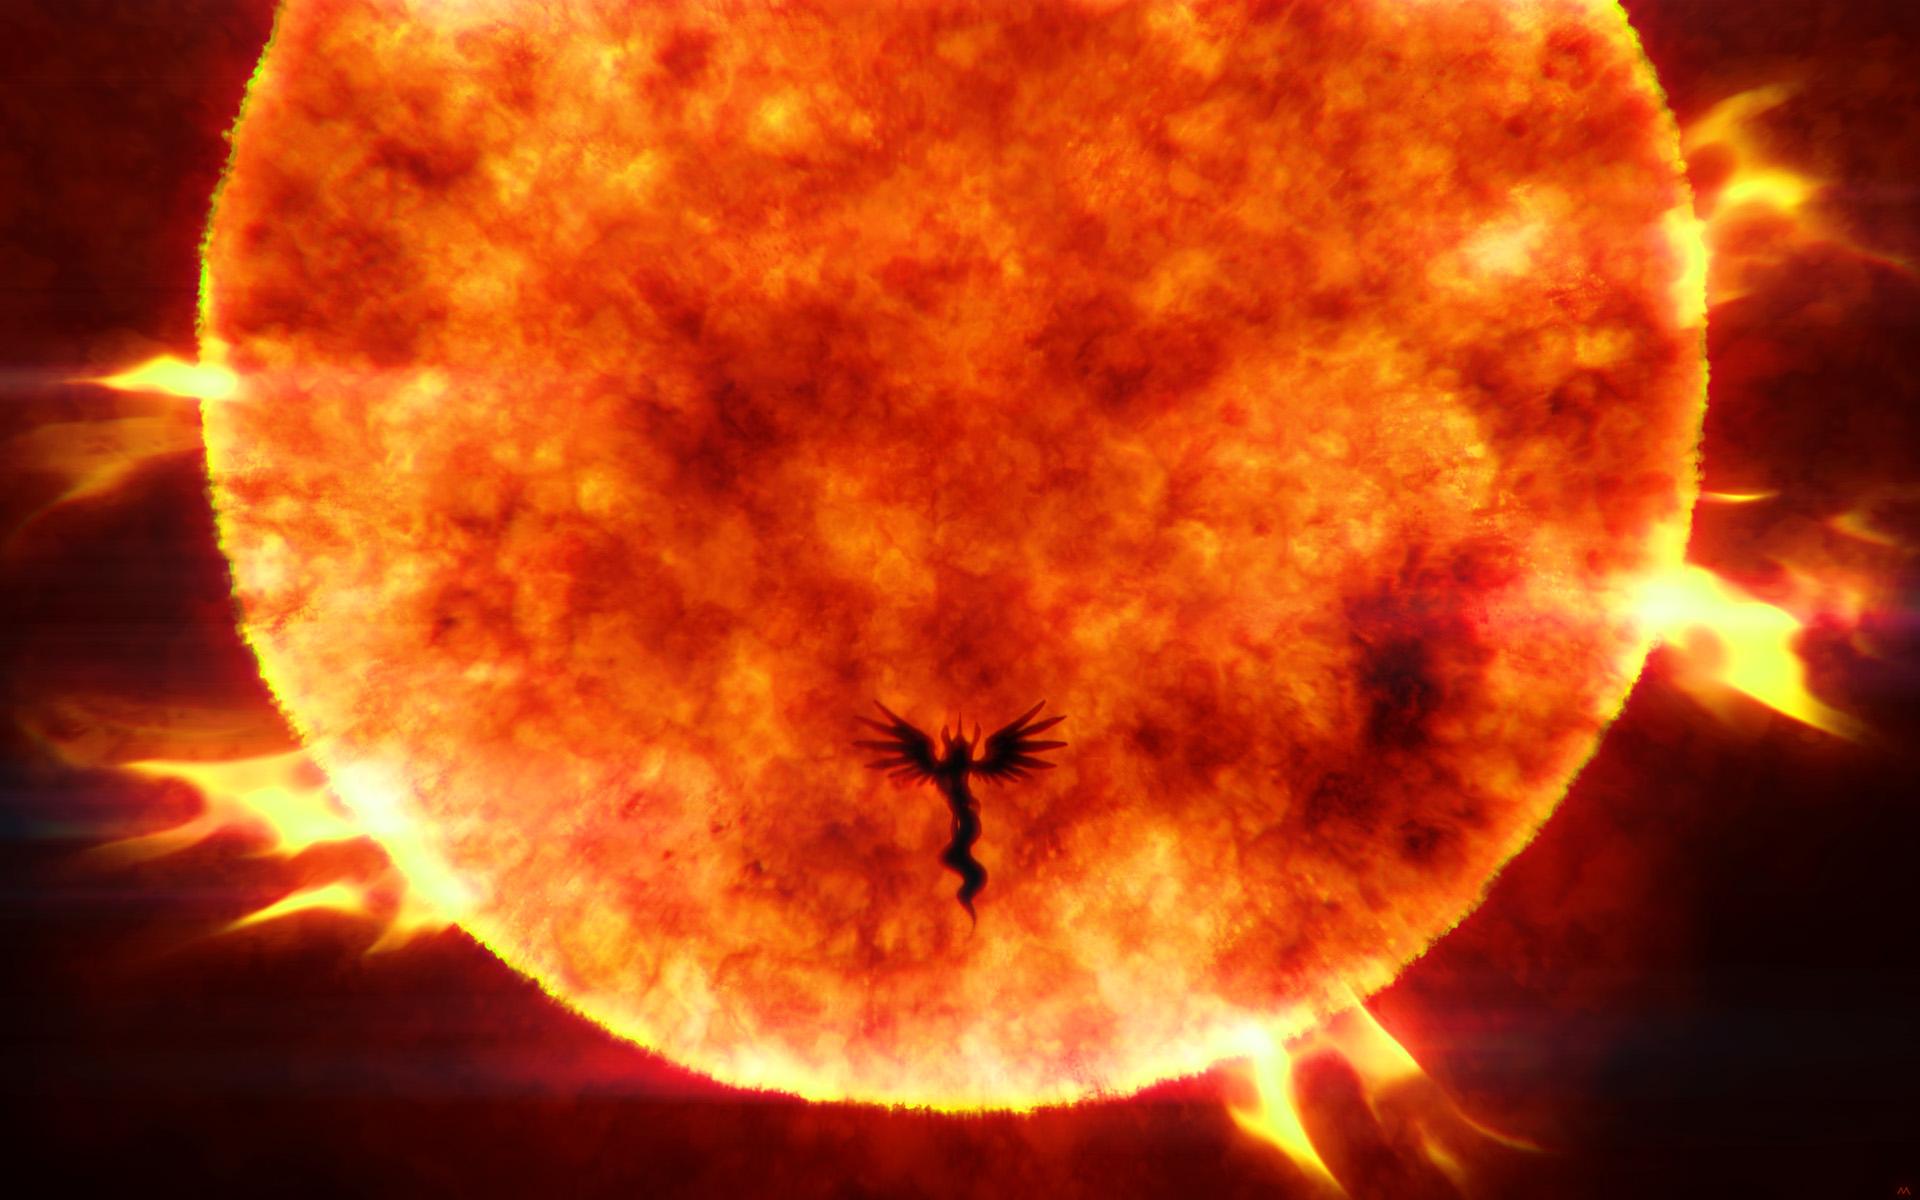 Raising the Sun by cmaggot